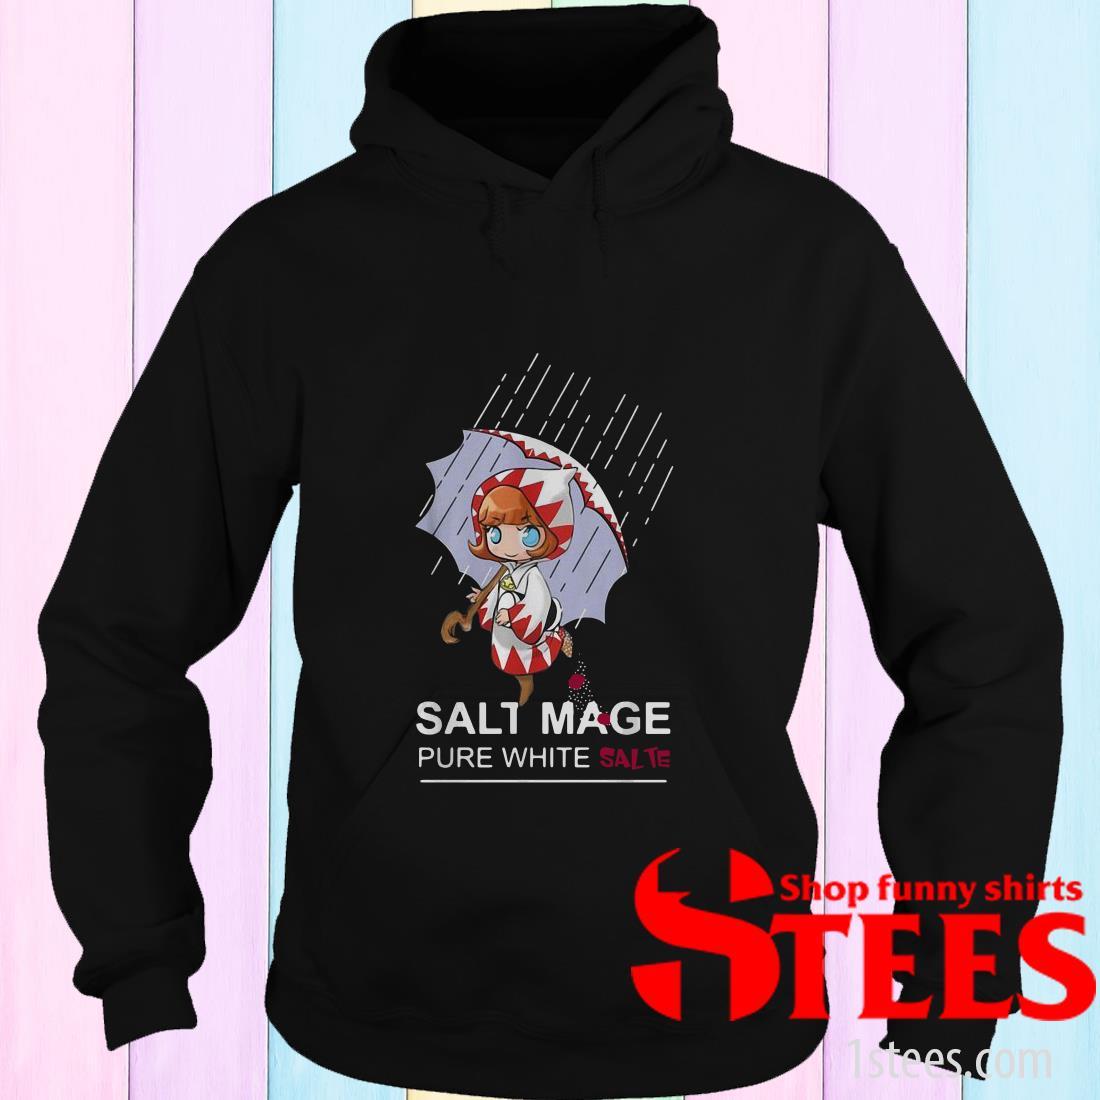 Salt Mage Pure White Salt White Mage Final Fantasy Hoodies